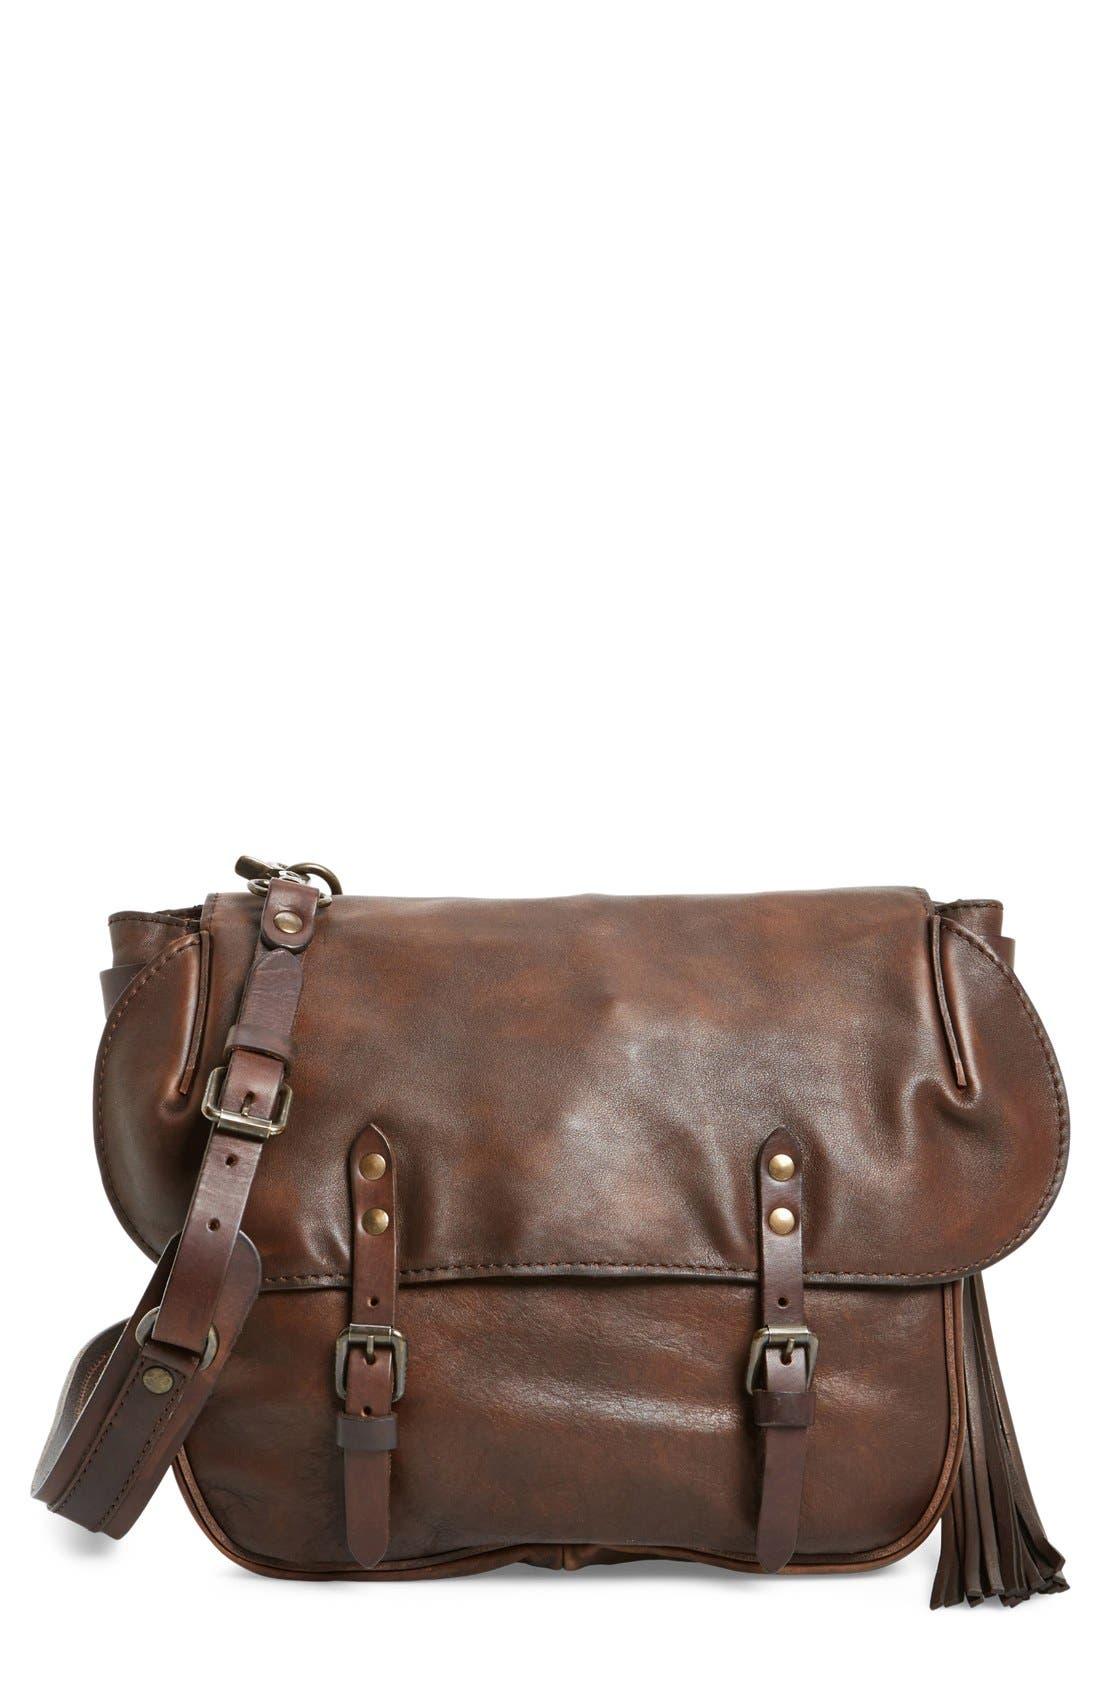 Main Image - Frye 'Veronica' Crossbody Bag